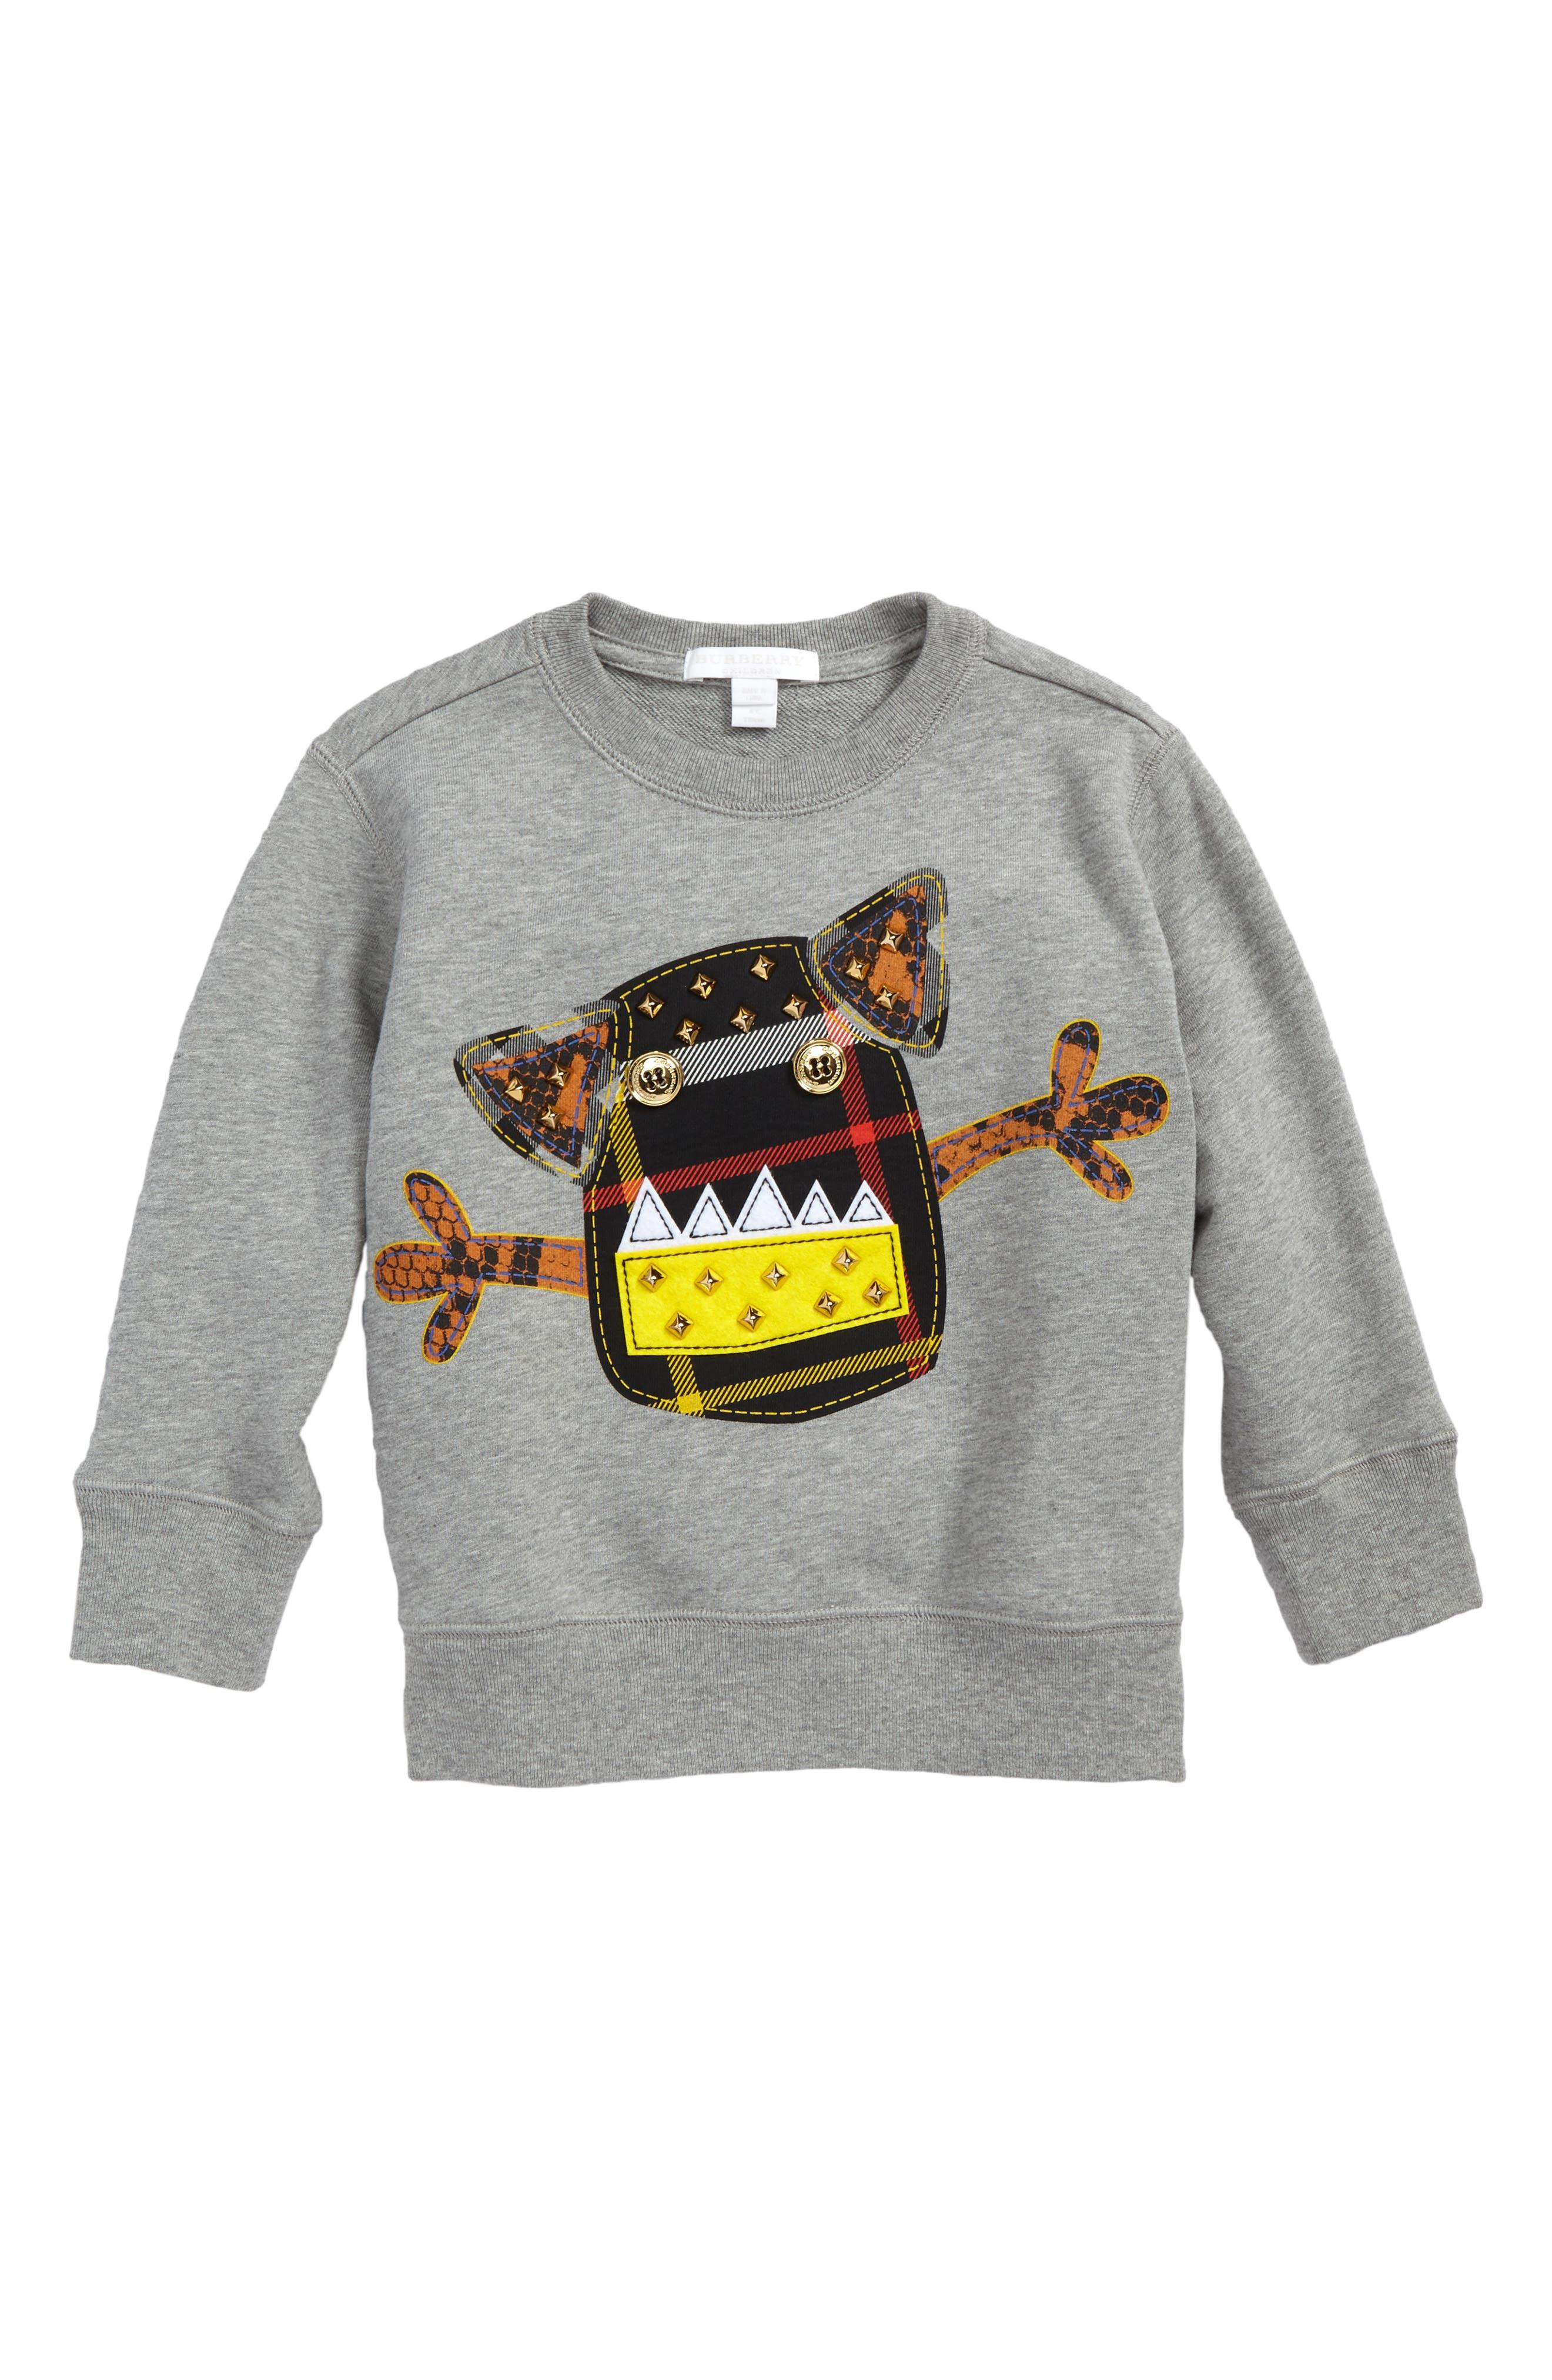 Alternate Image 1 Selected - Burberry Monster Sweatshirt (Little Boys & Big Boys)